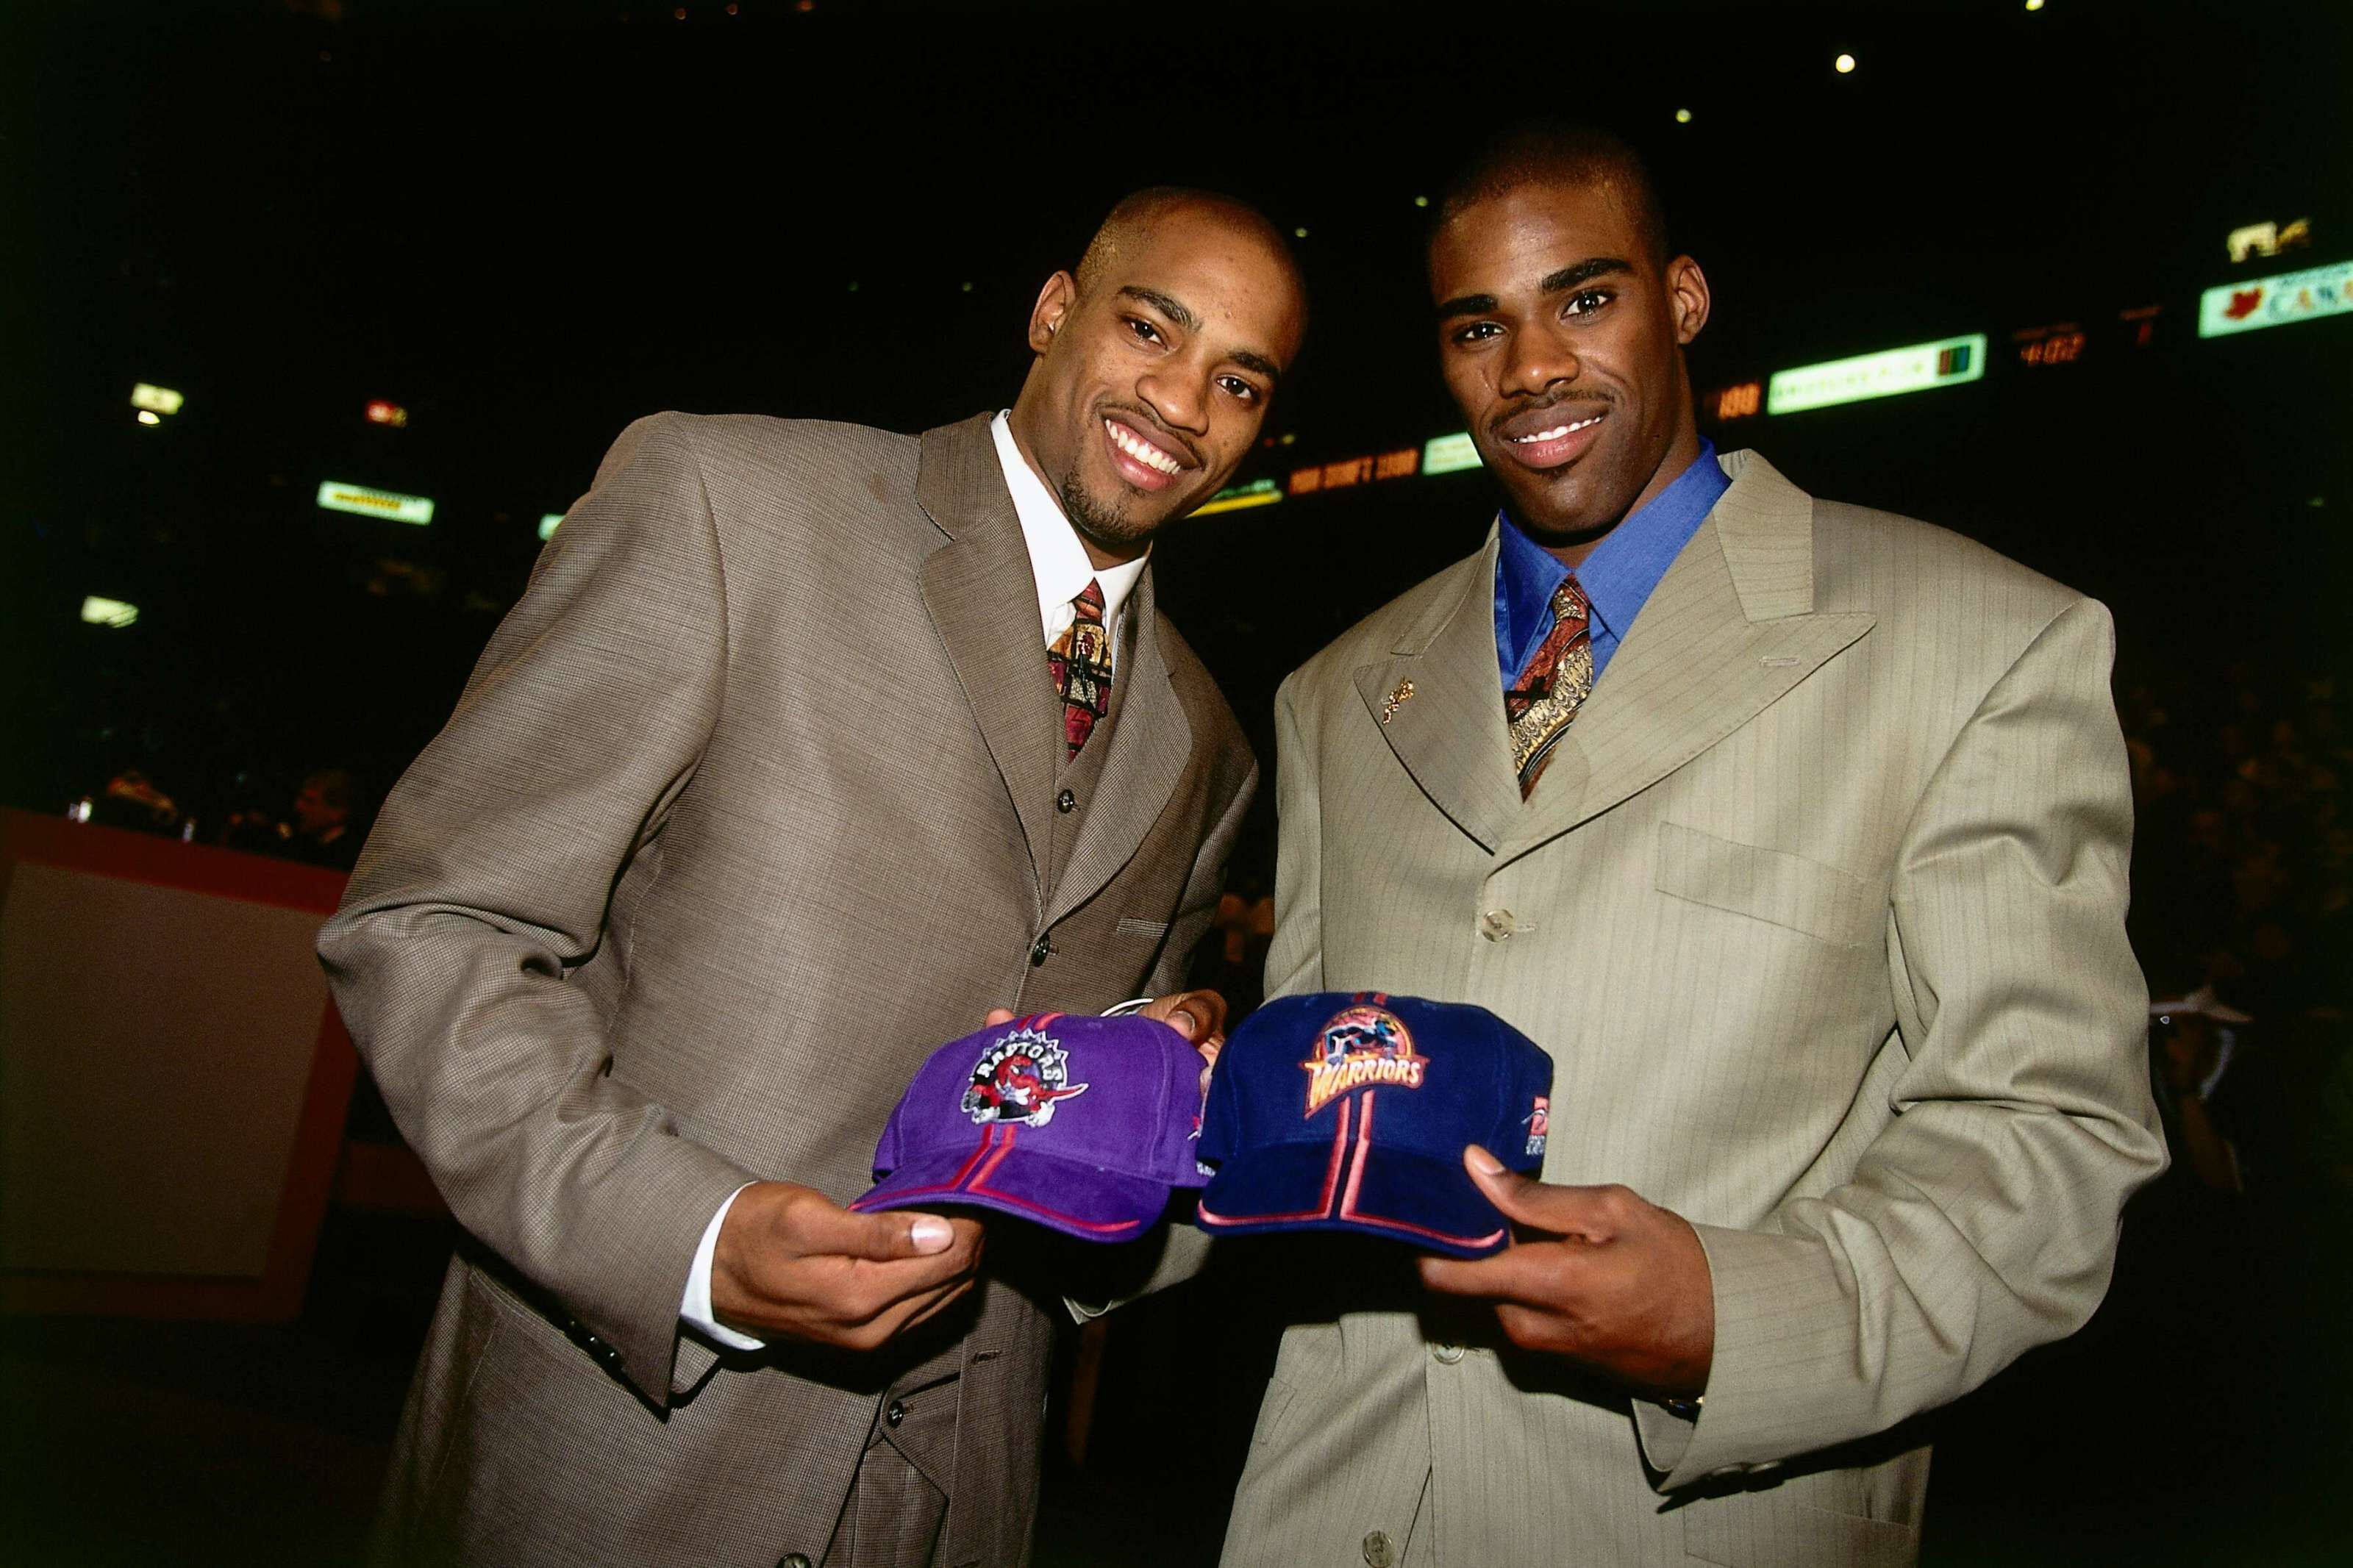 super popular a6975 1bae4 Toronto Raptors: 23 days of history - trading for Vince Carter